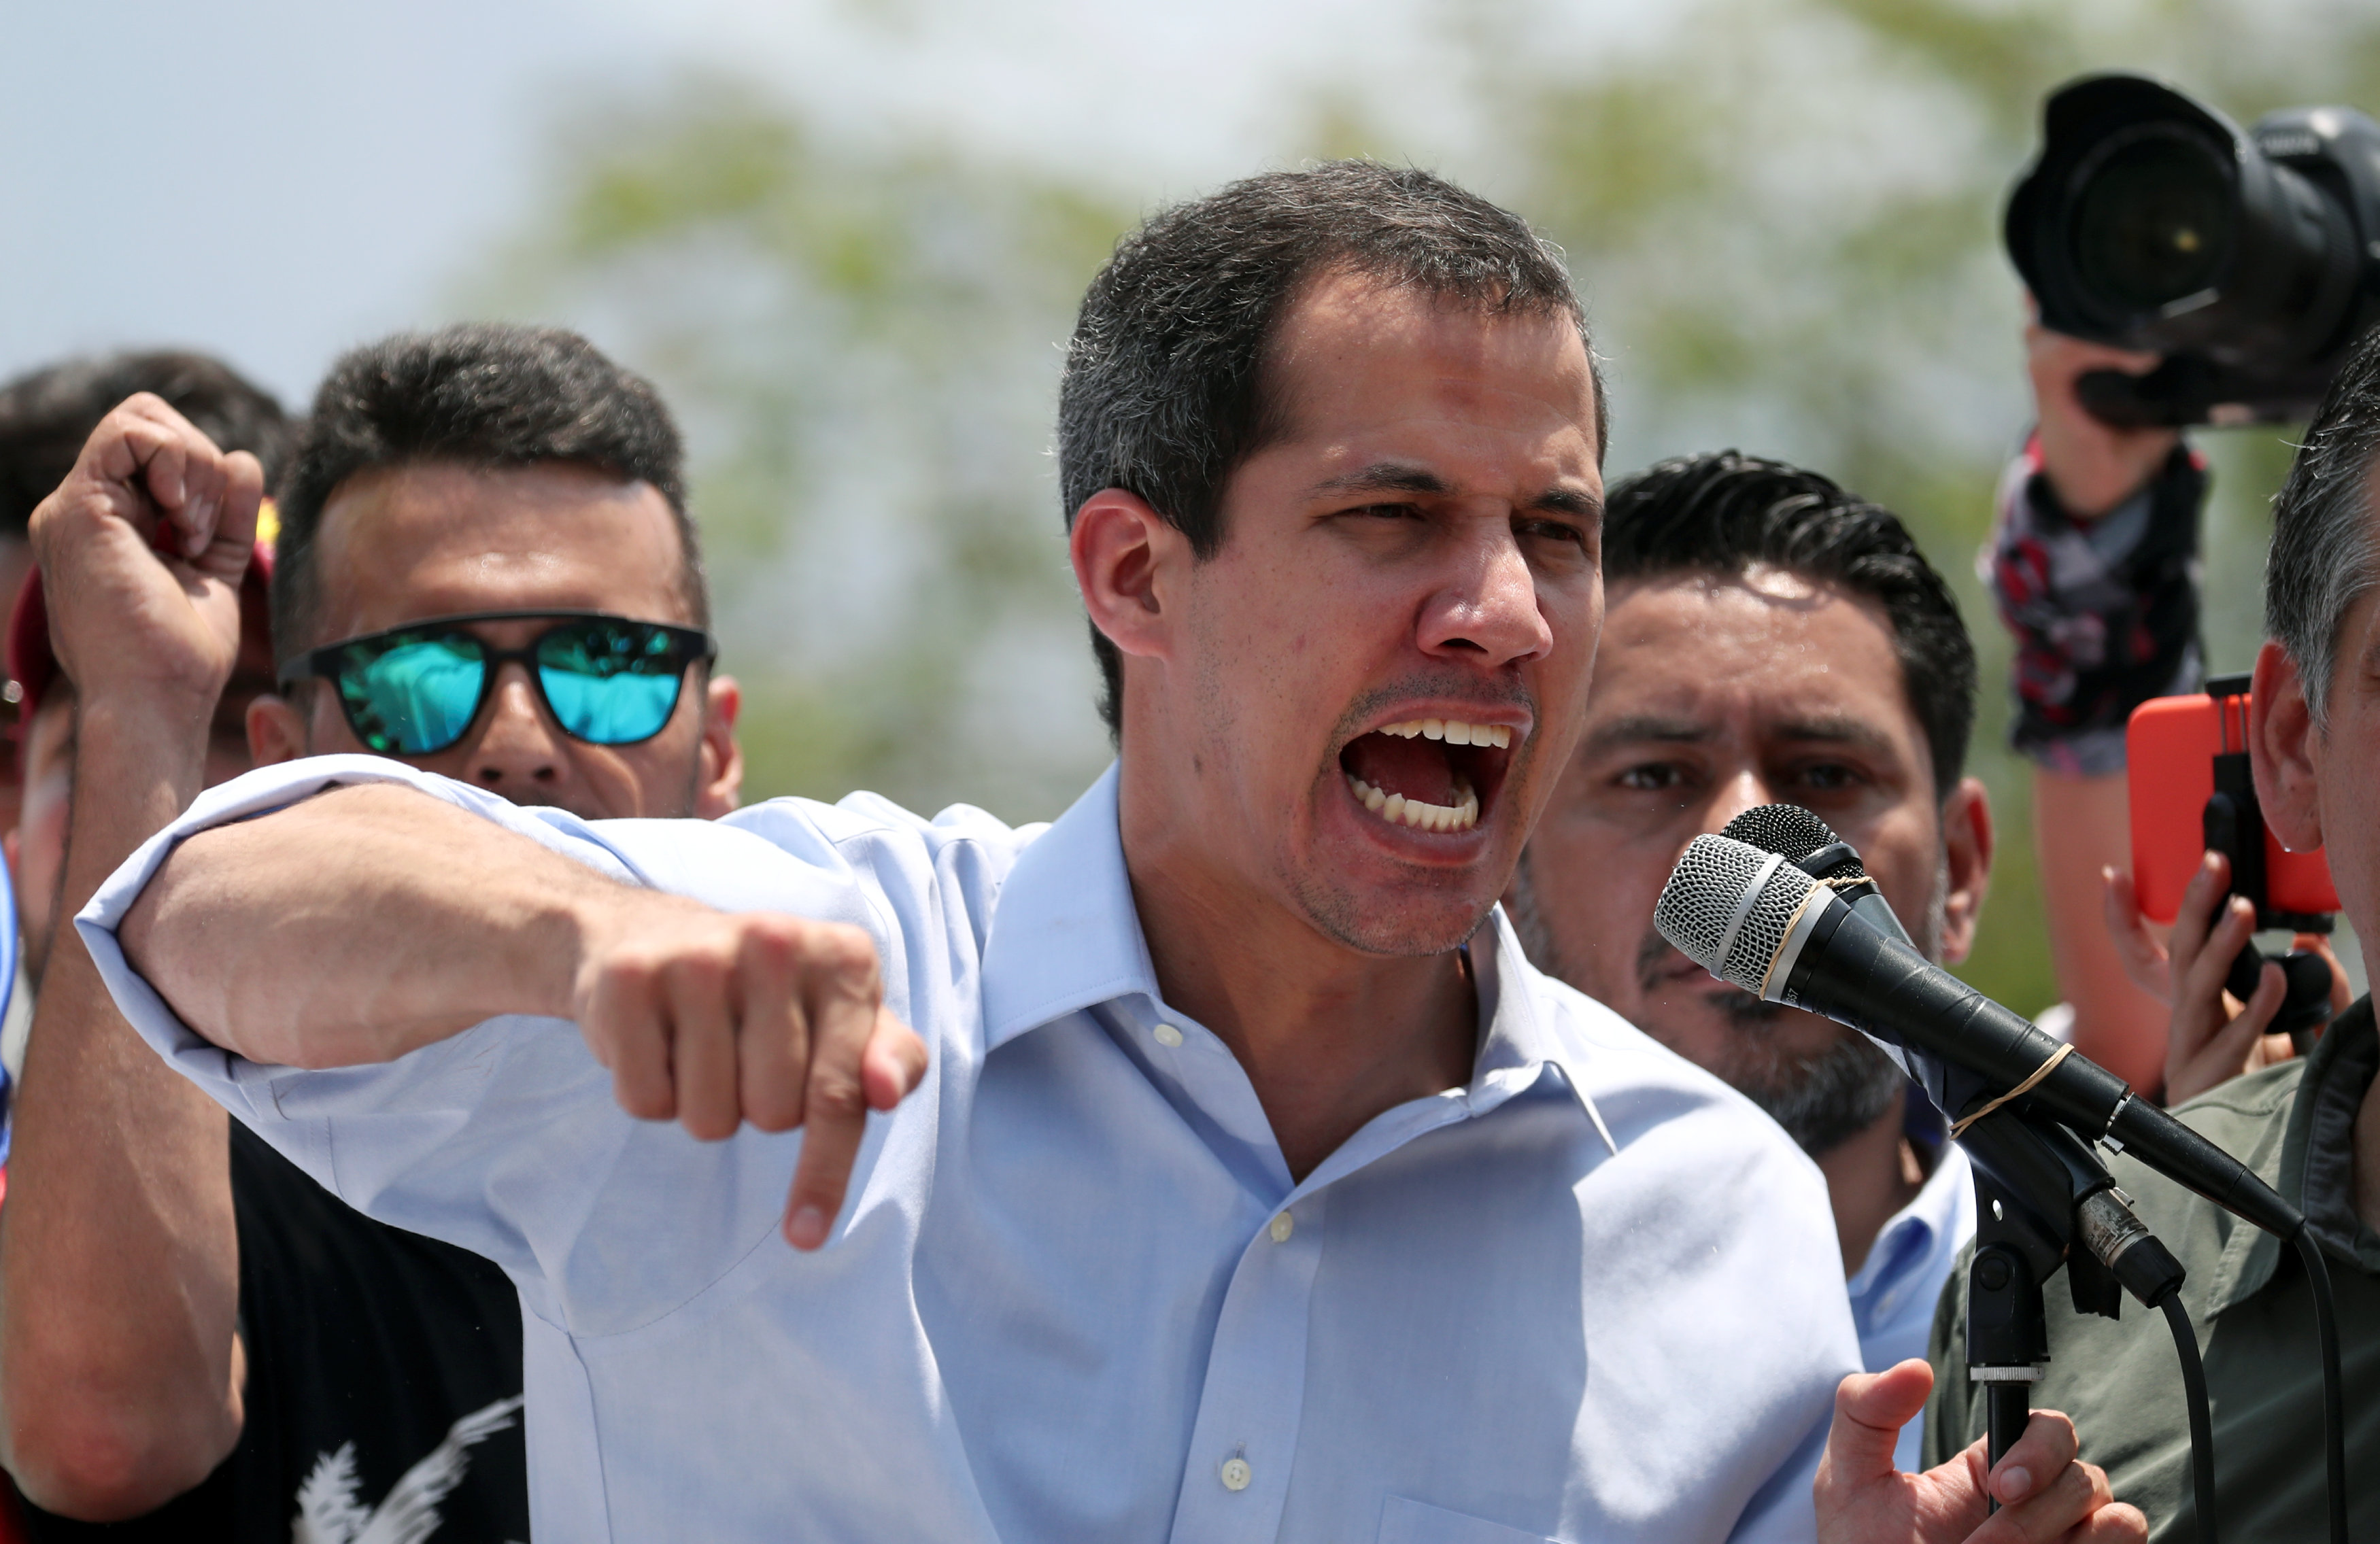 """Se van a hundir con el dictador"": El DURO mensaje que le envió Guaidó a la FAN"